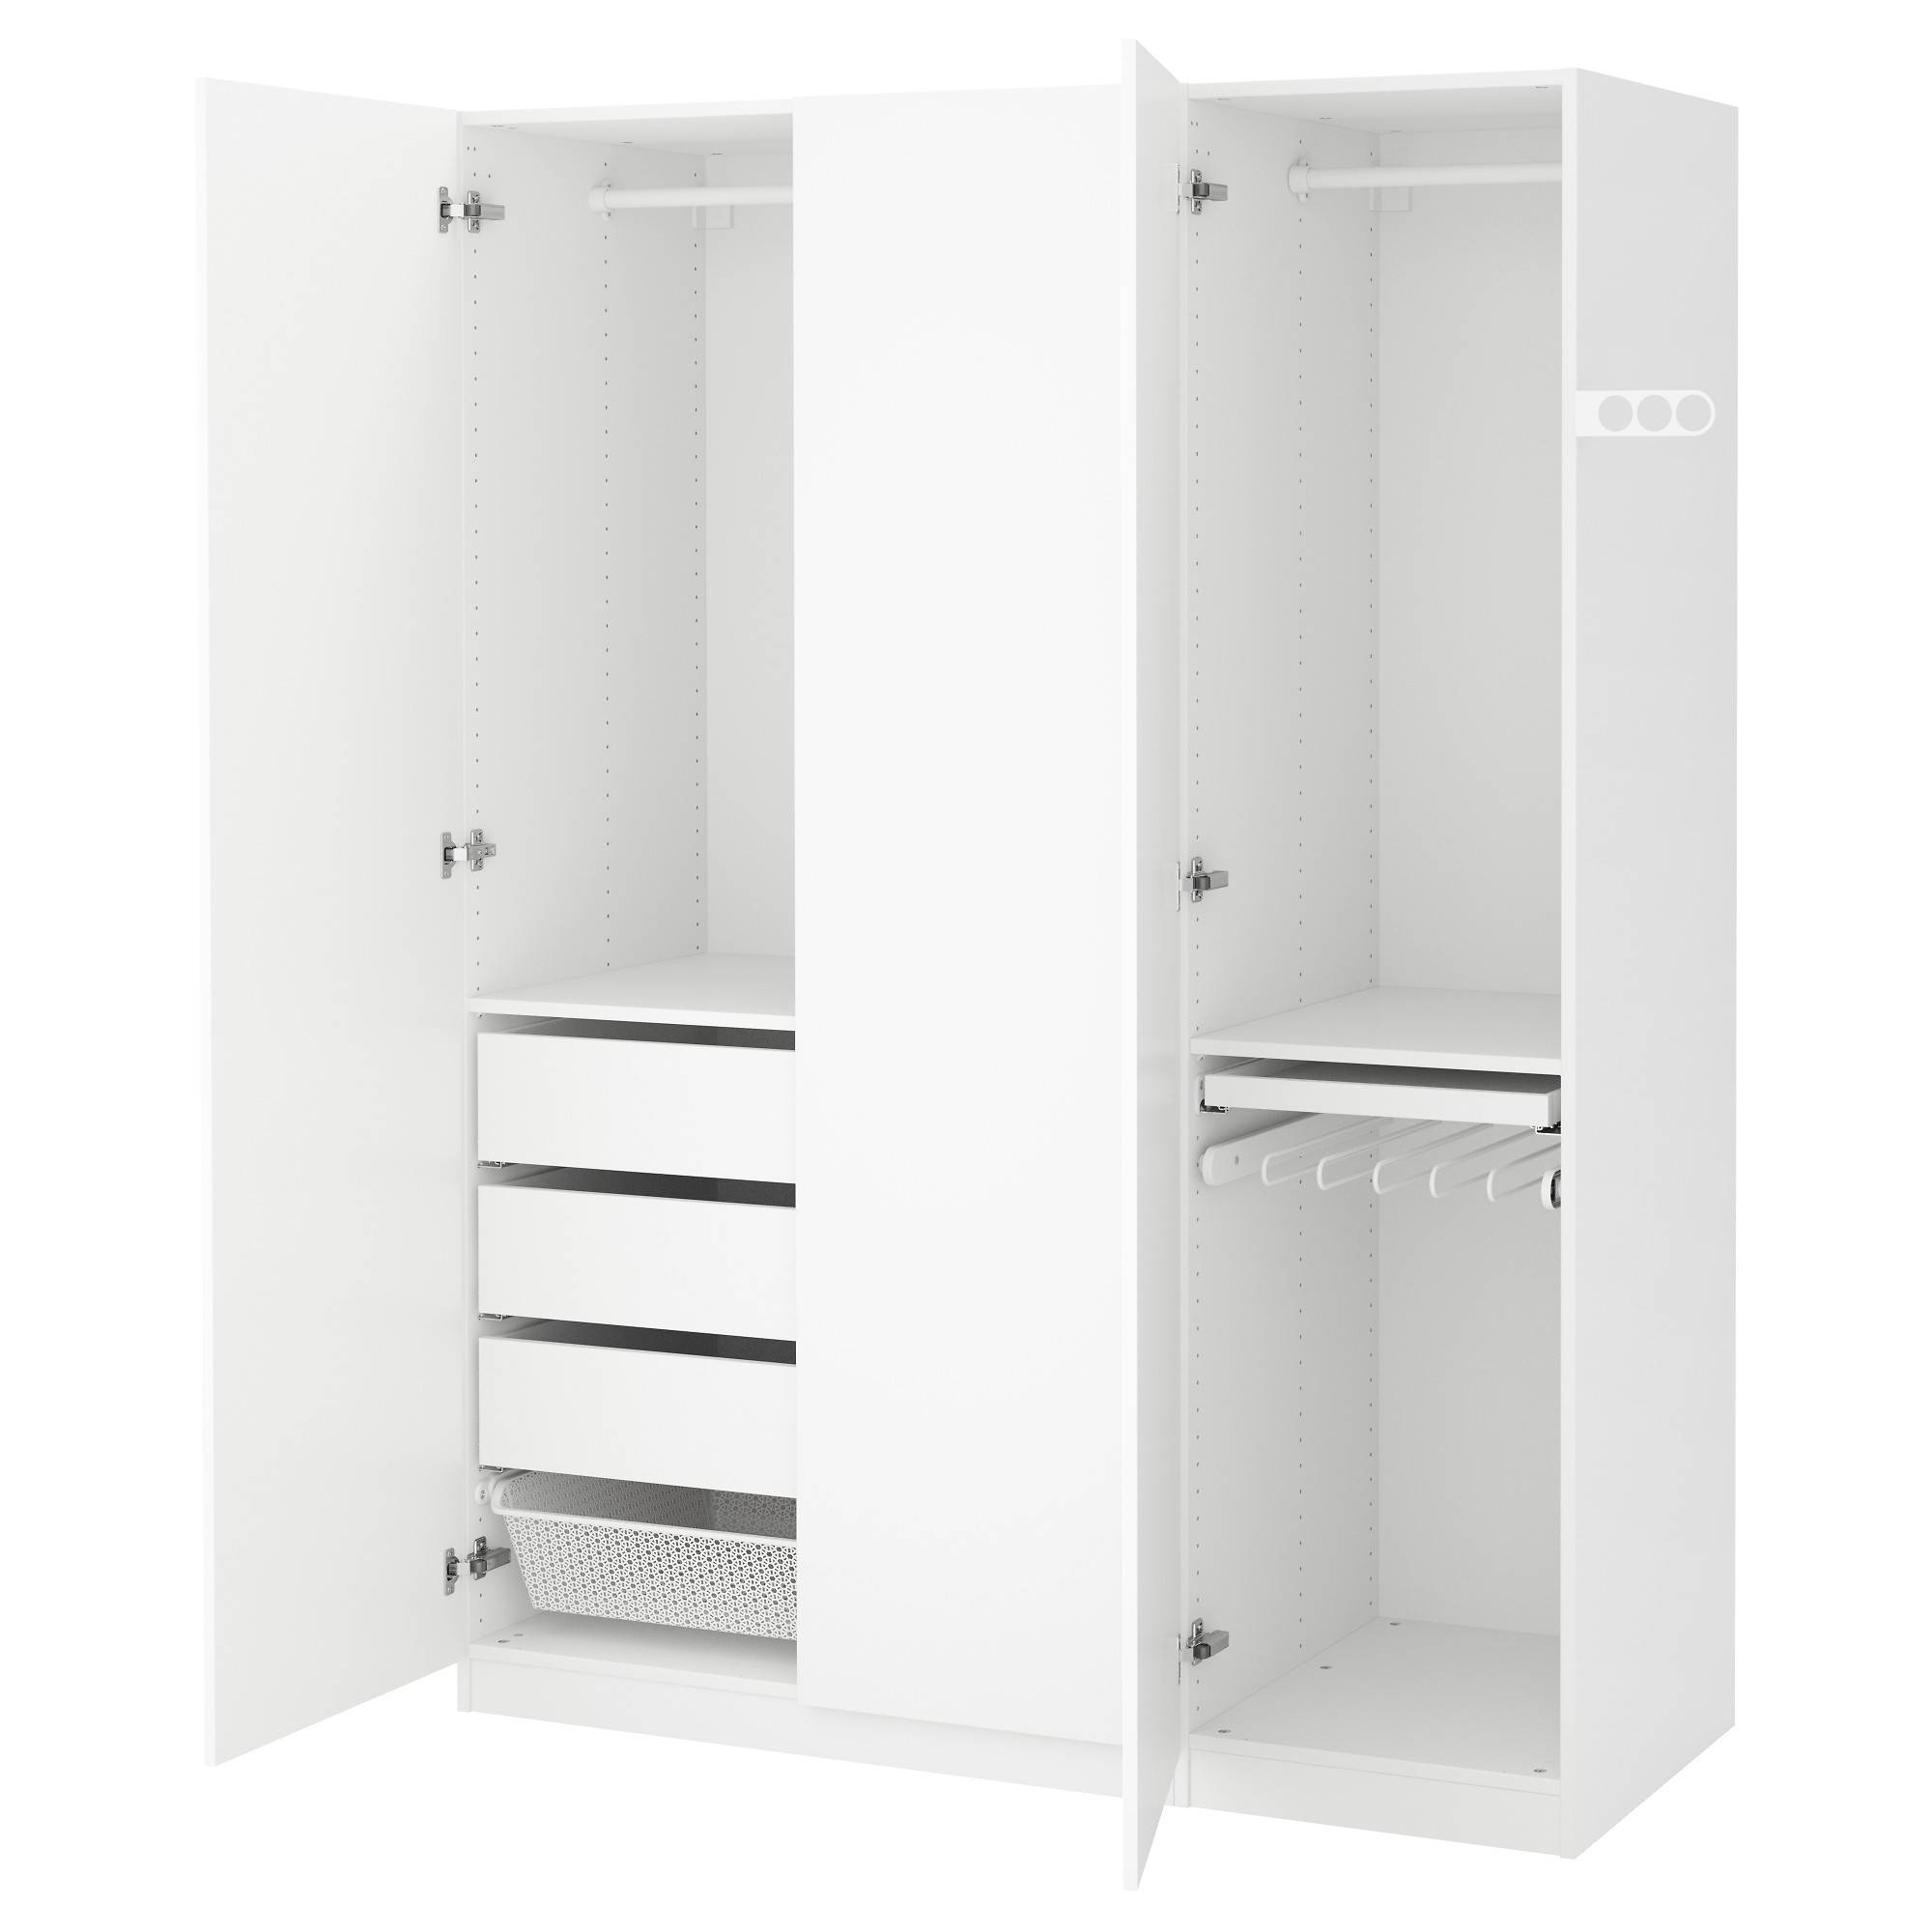 Wardrobes | Ikea Ireland - Dublin inside White Single Door Wardrobes (Image 13 of 15)